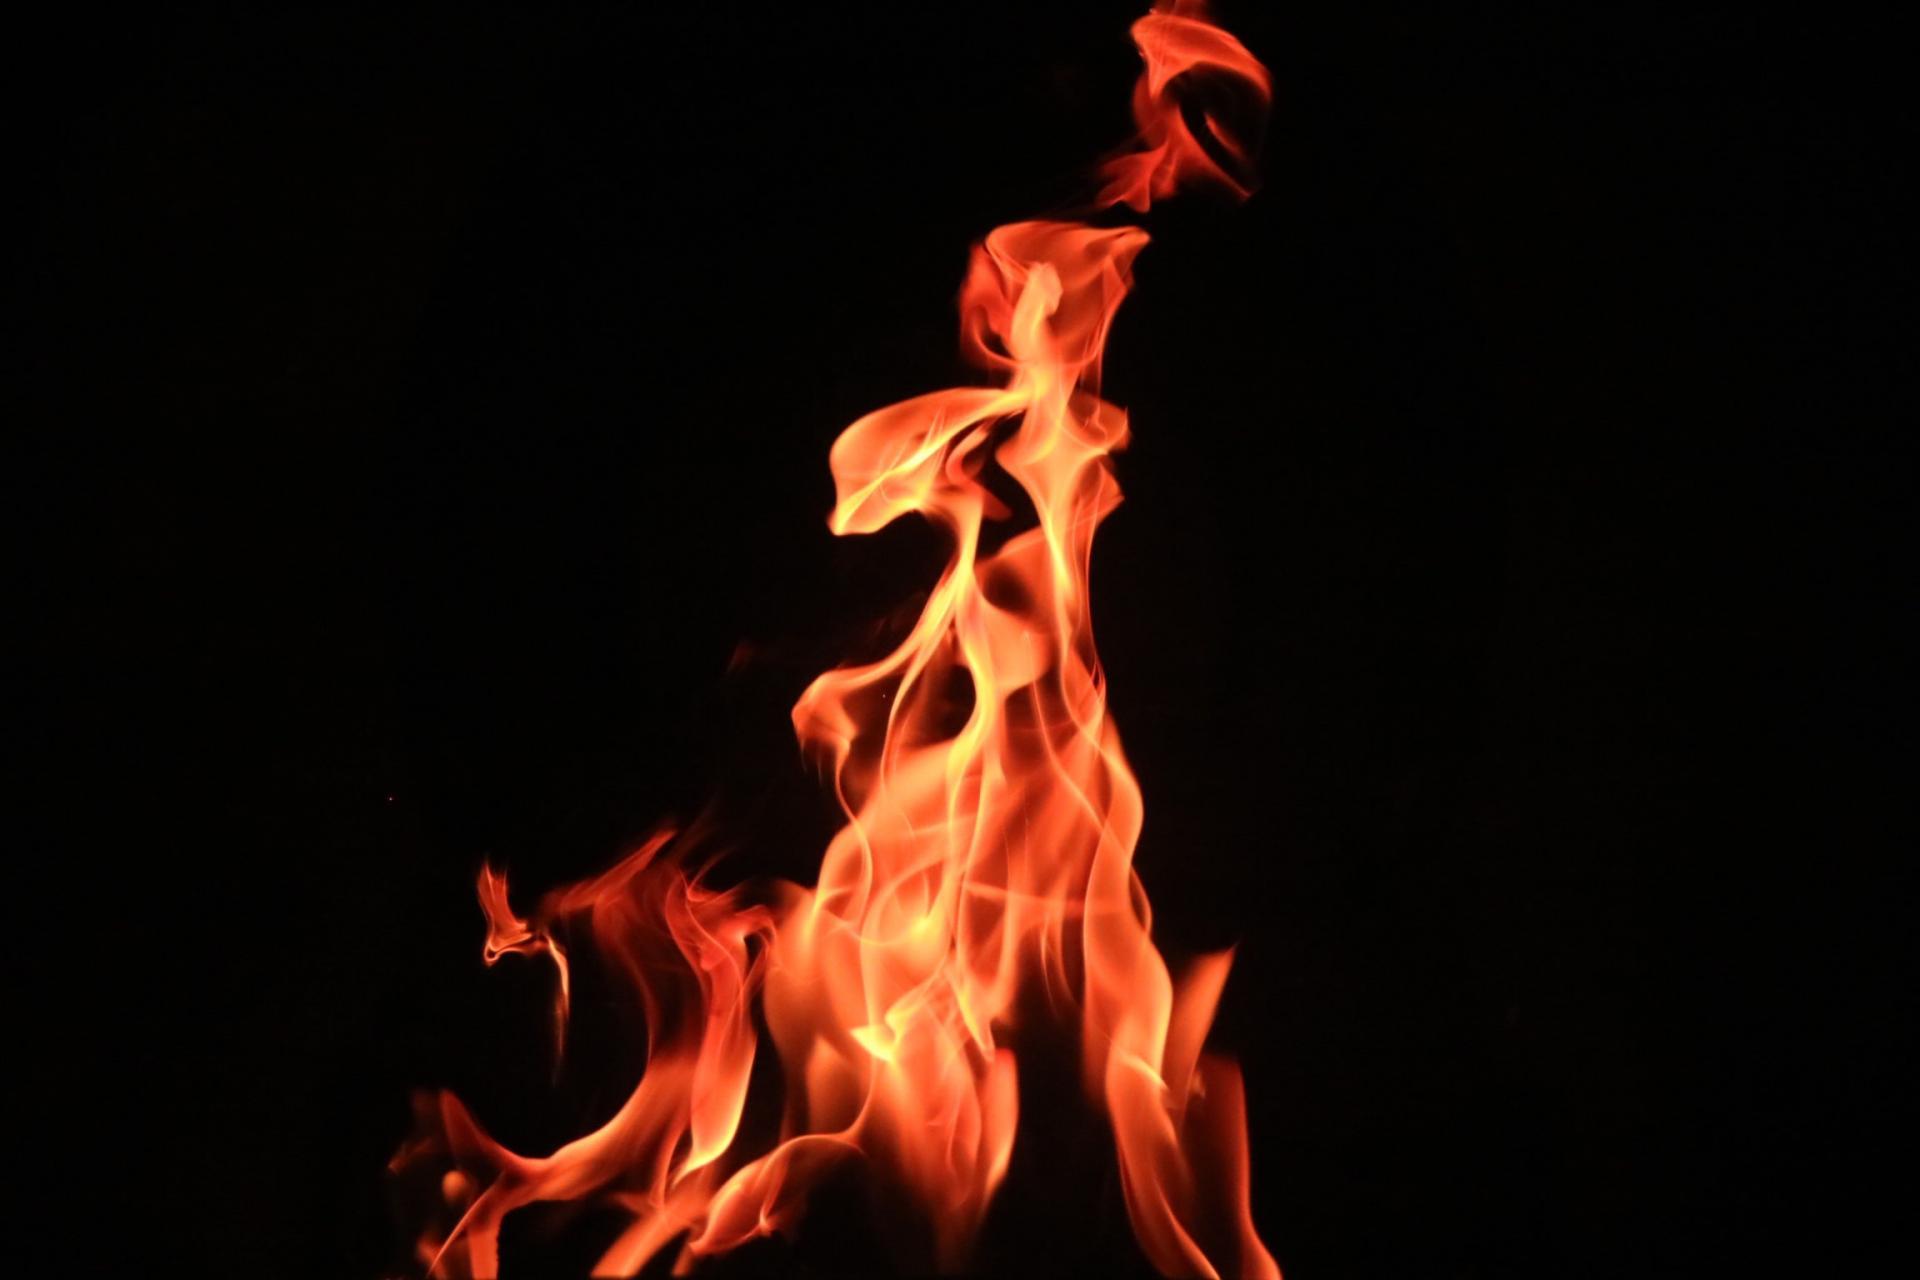 Pentecote feu